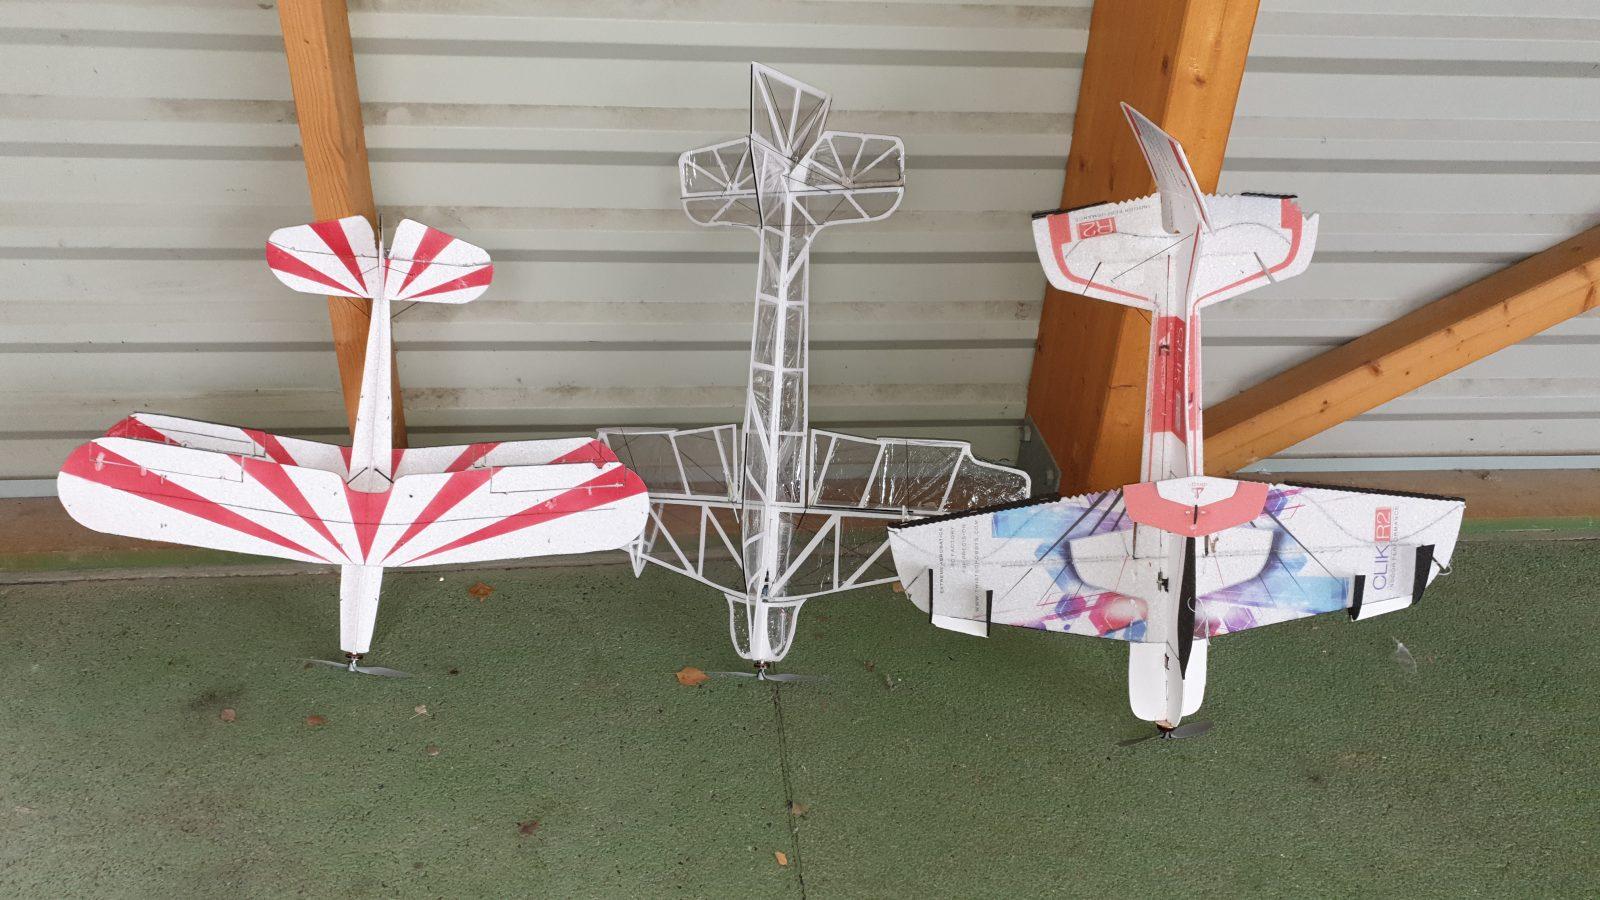 Epp SV4 test flights